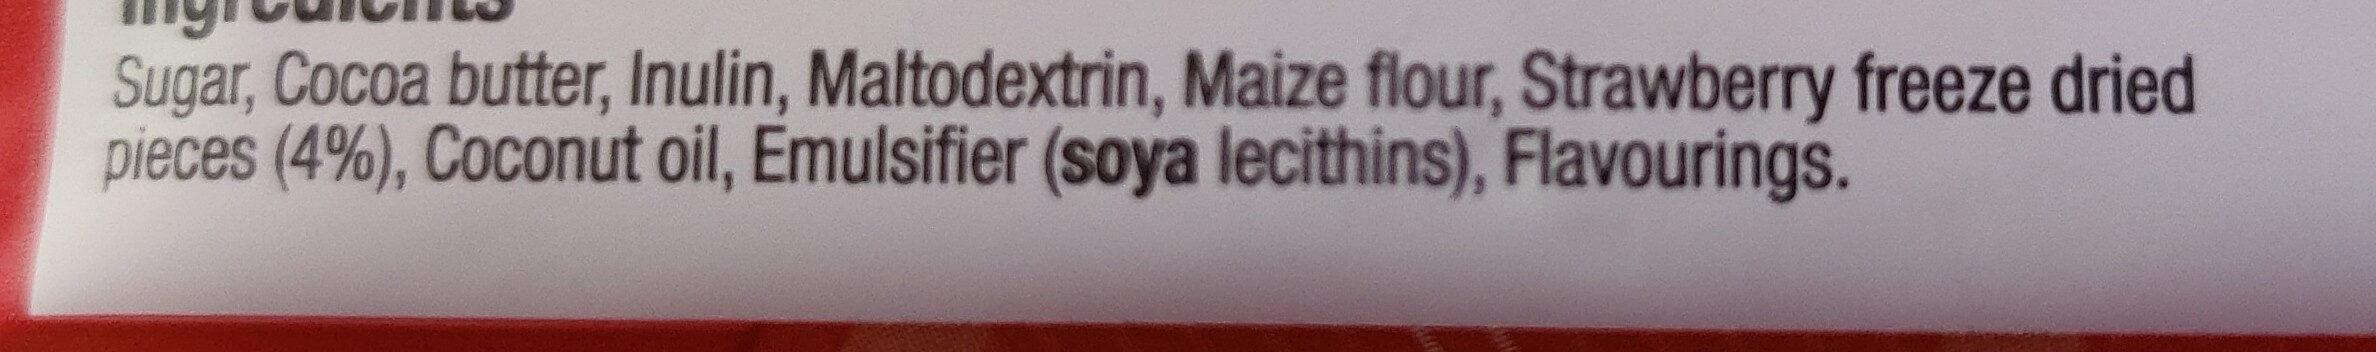 Strawberries and Cream White Chocolate Bar - Ingredients - en